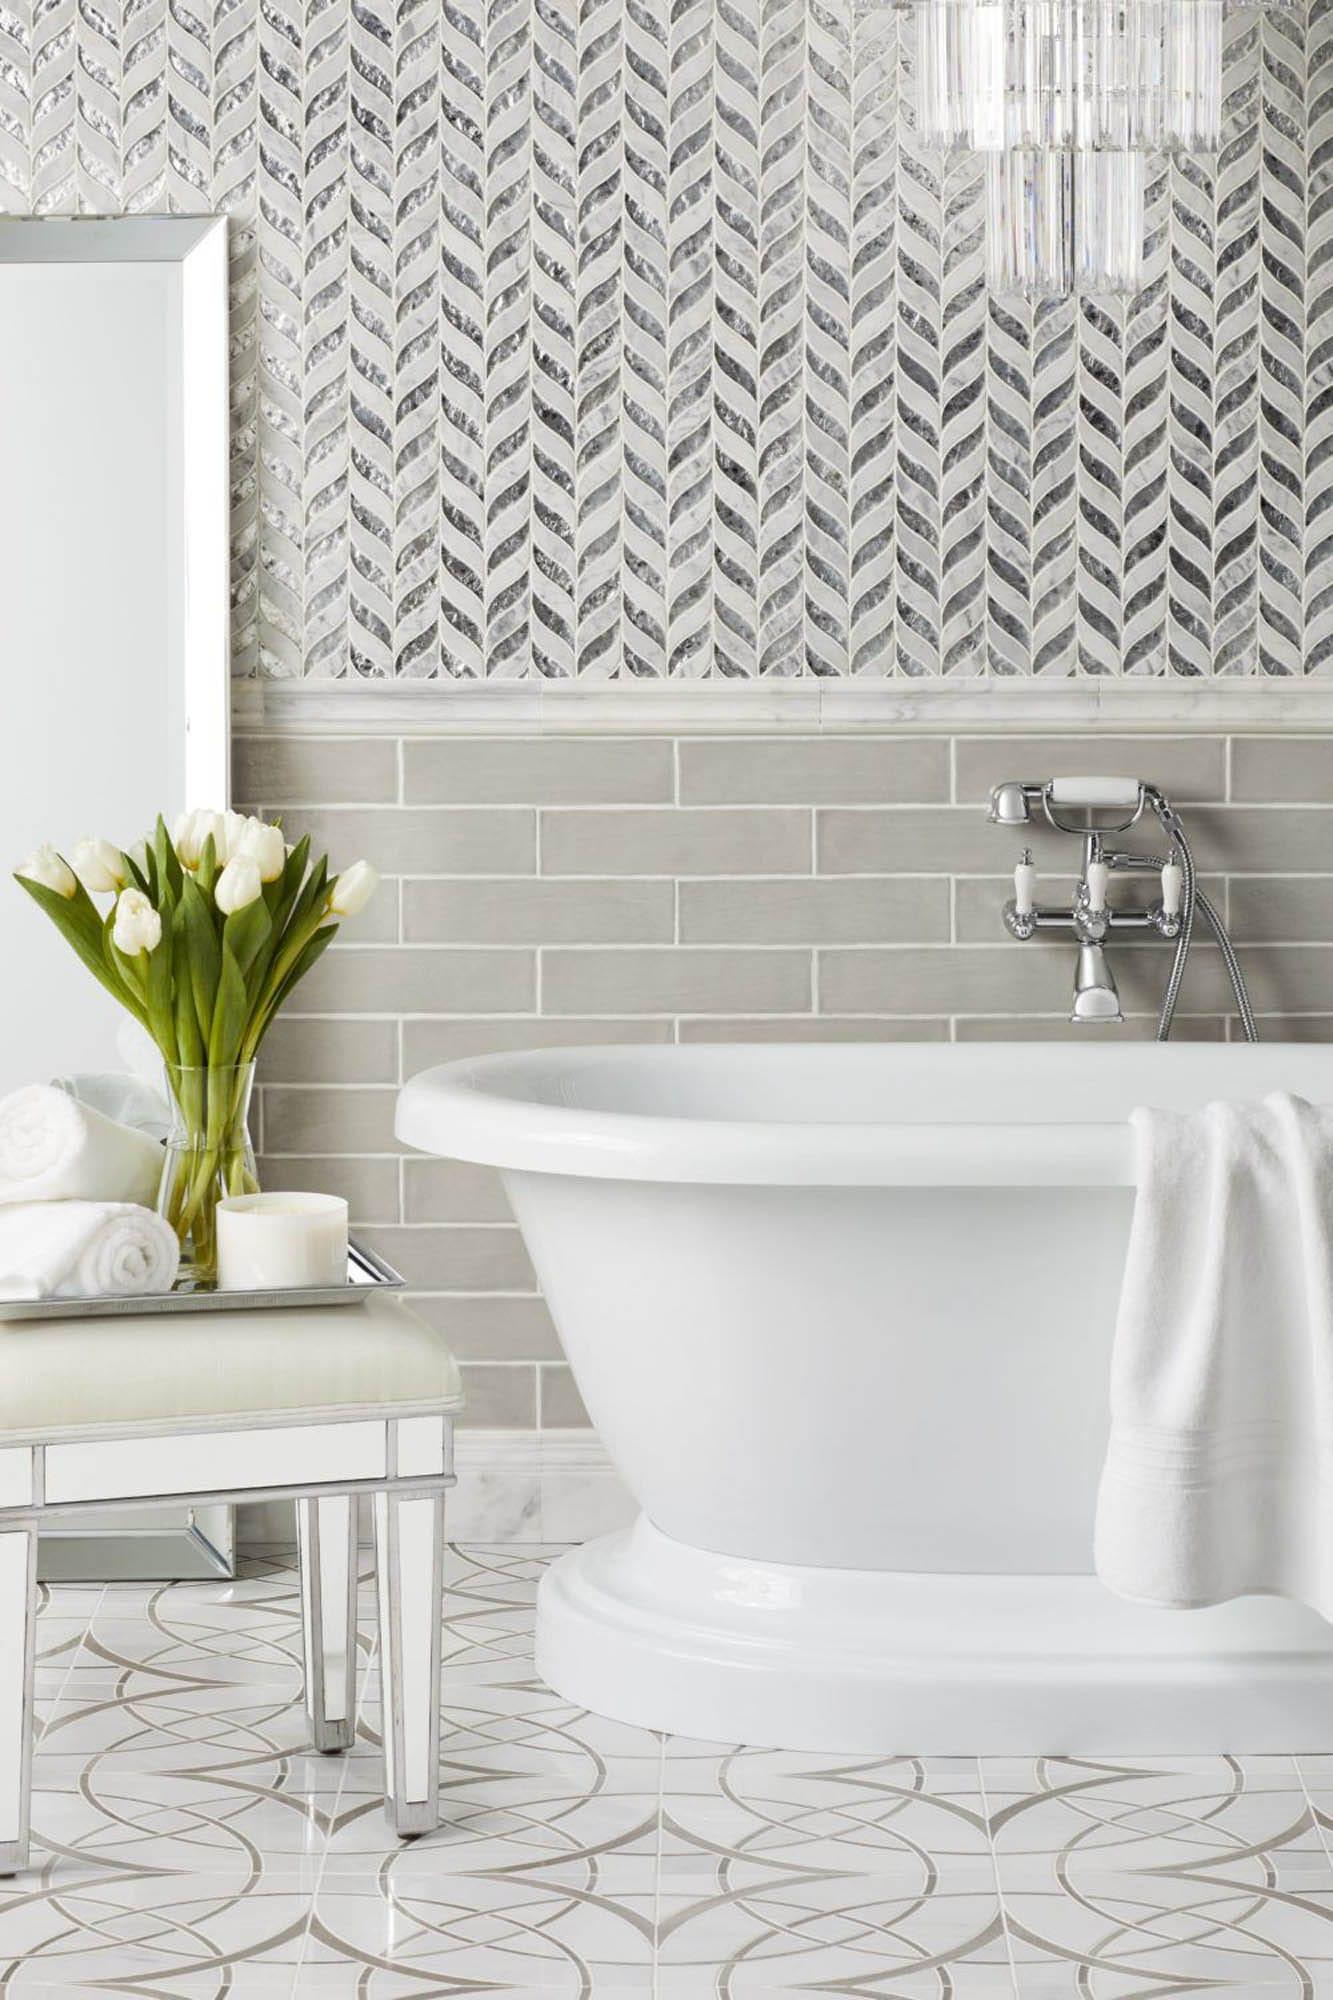 Mosaic bathroom wainscot